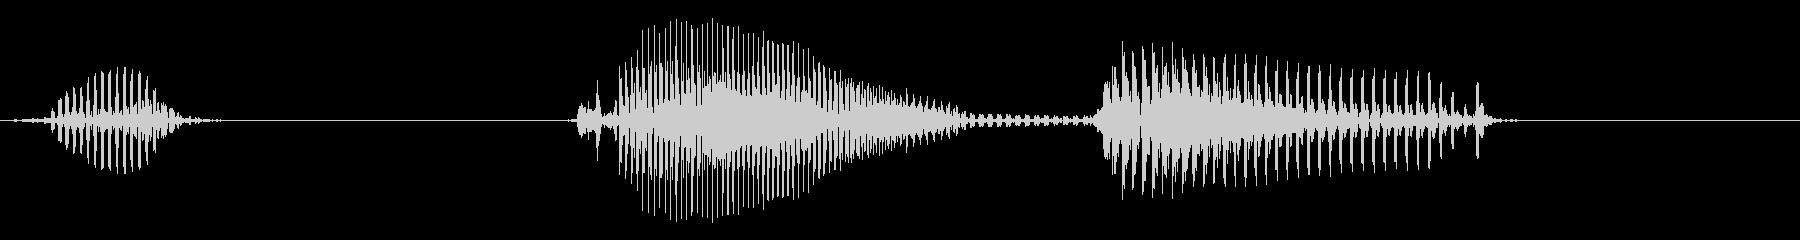 """Hokkaido"" (Hokkaido) 01's unreproduced waveform"